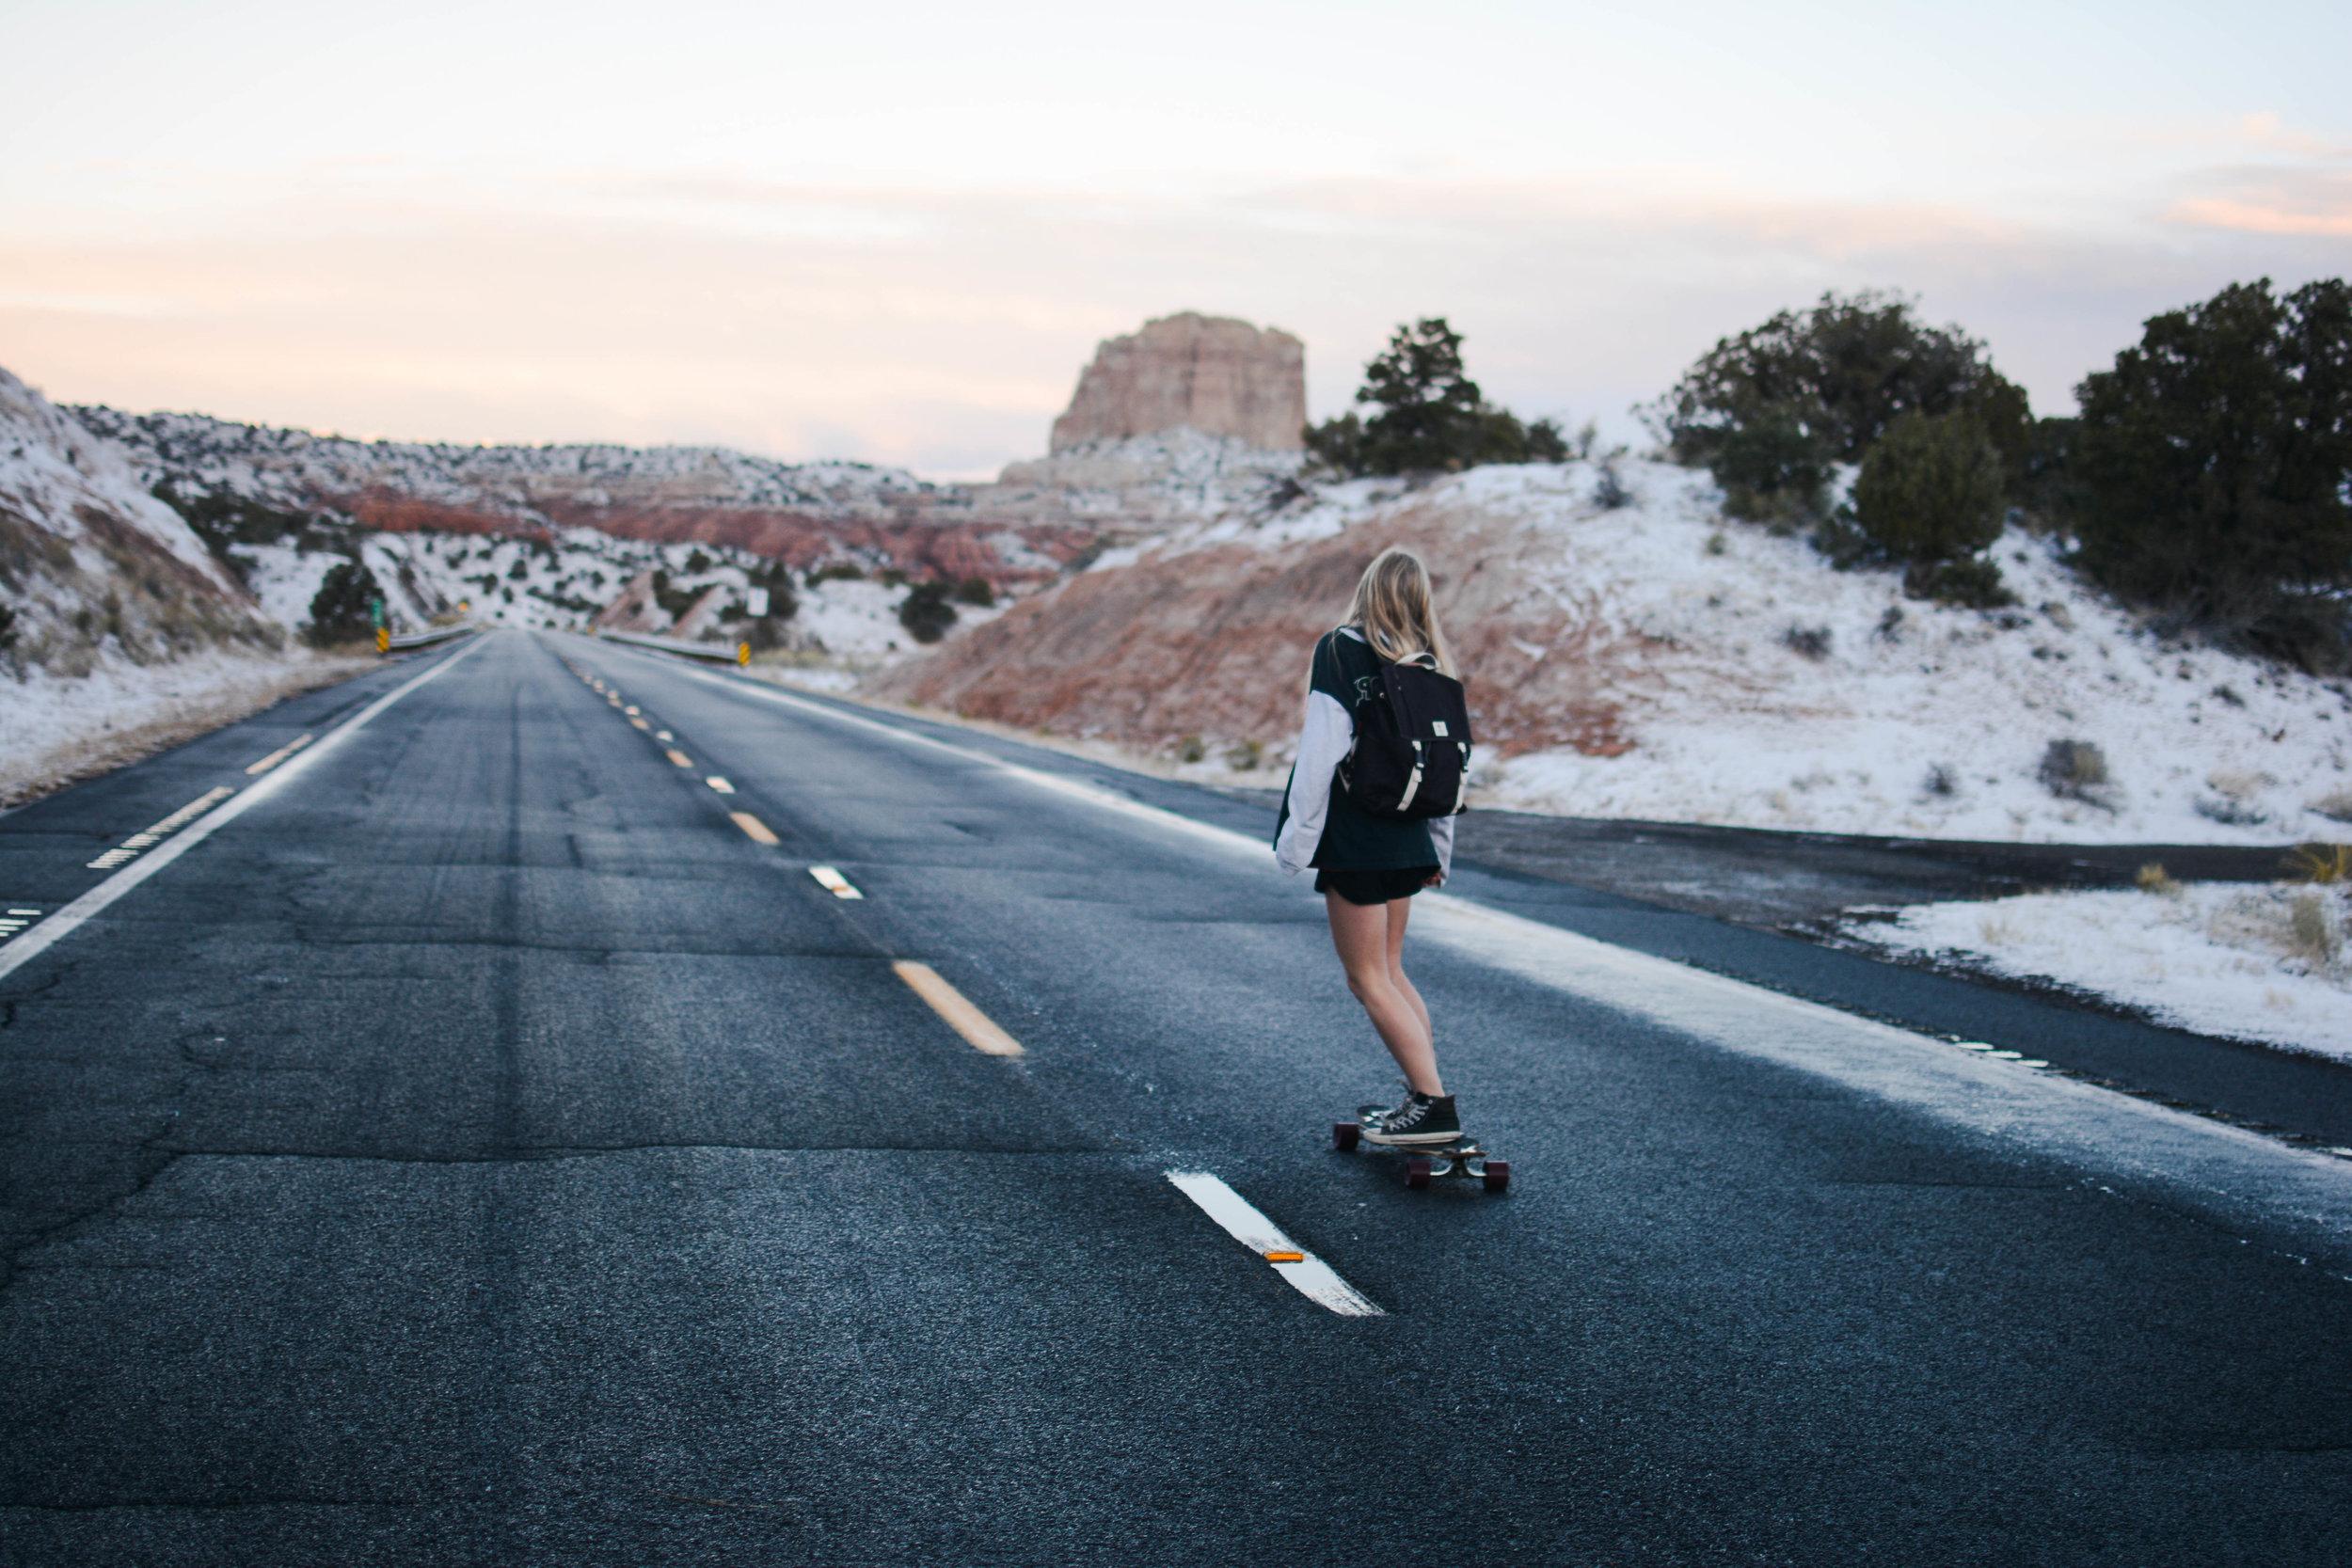 girlSkateboardStreet.jpeg